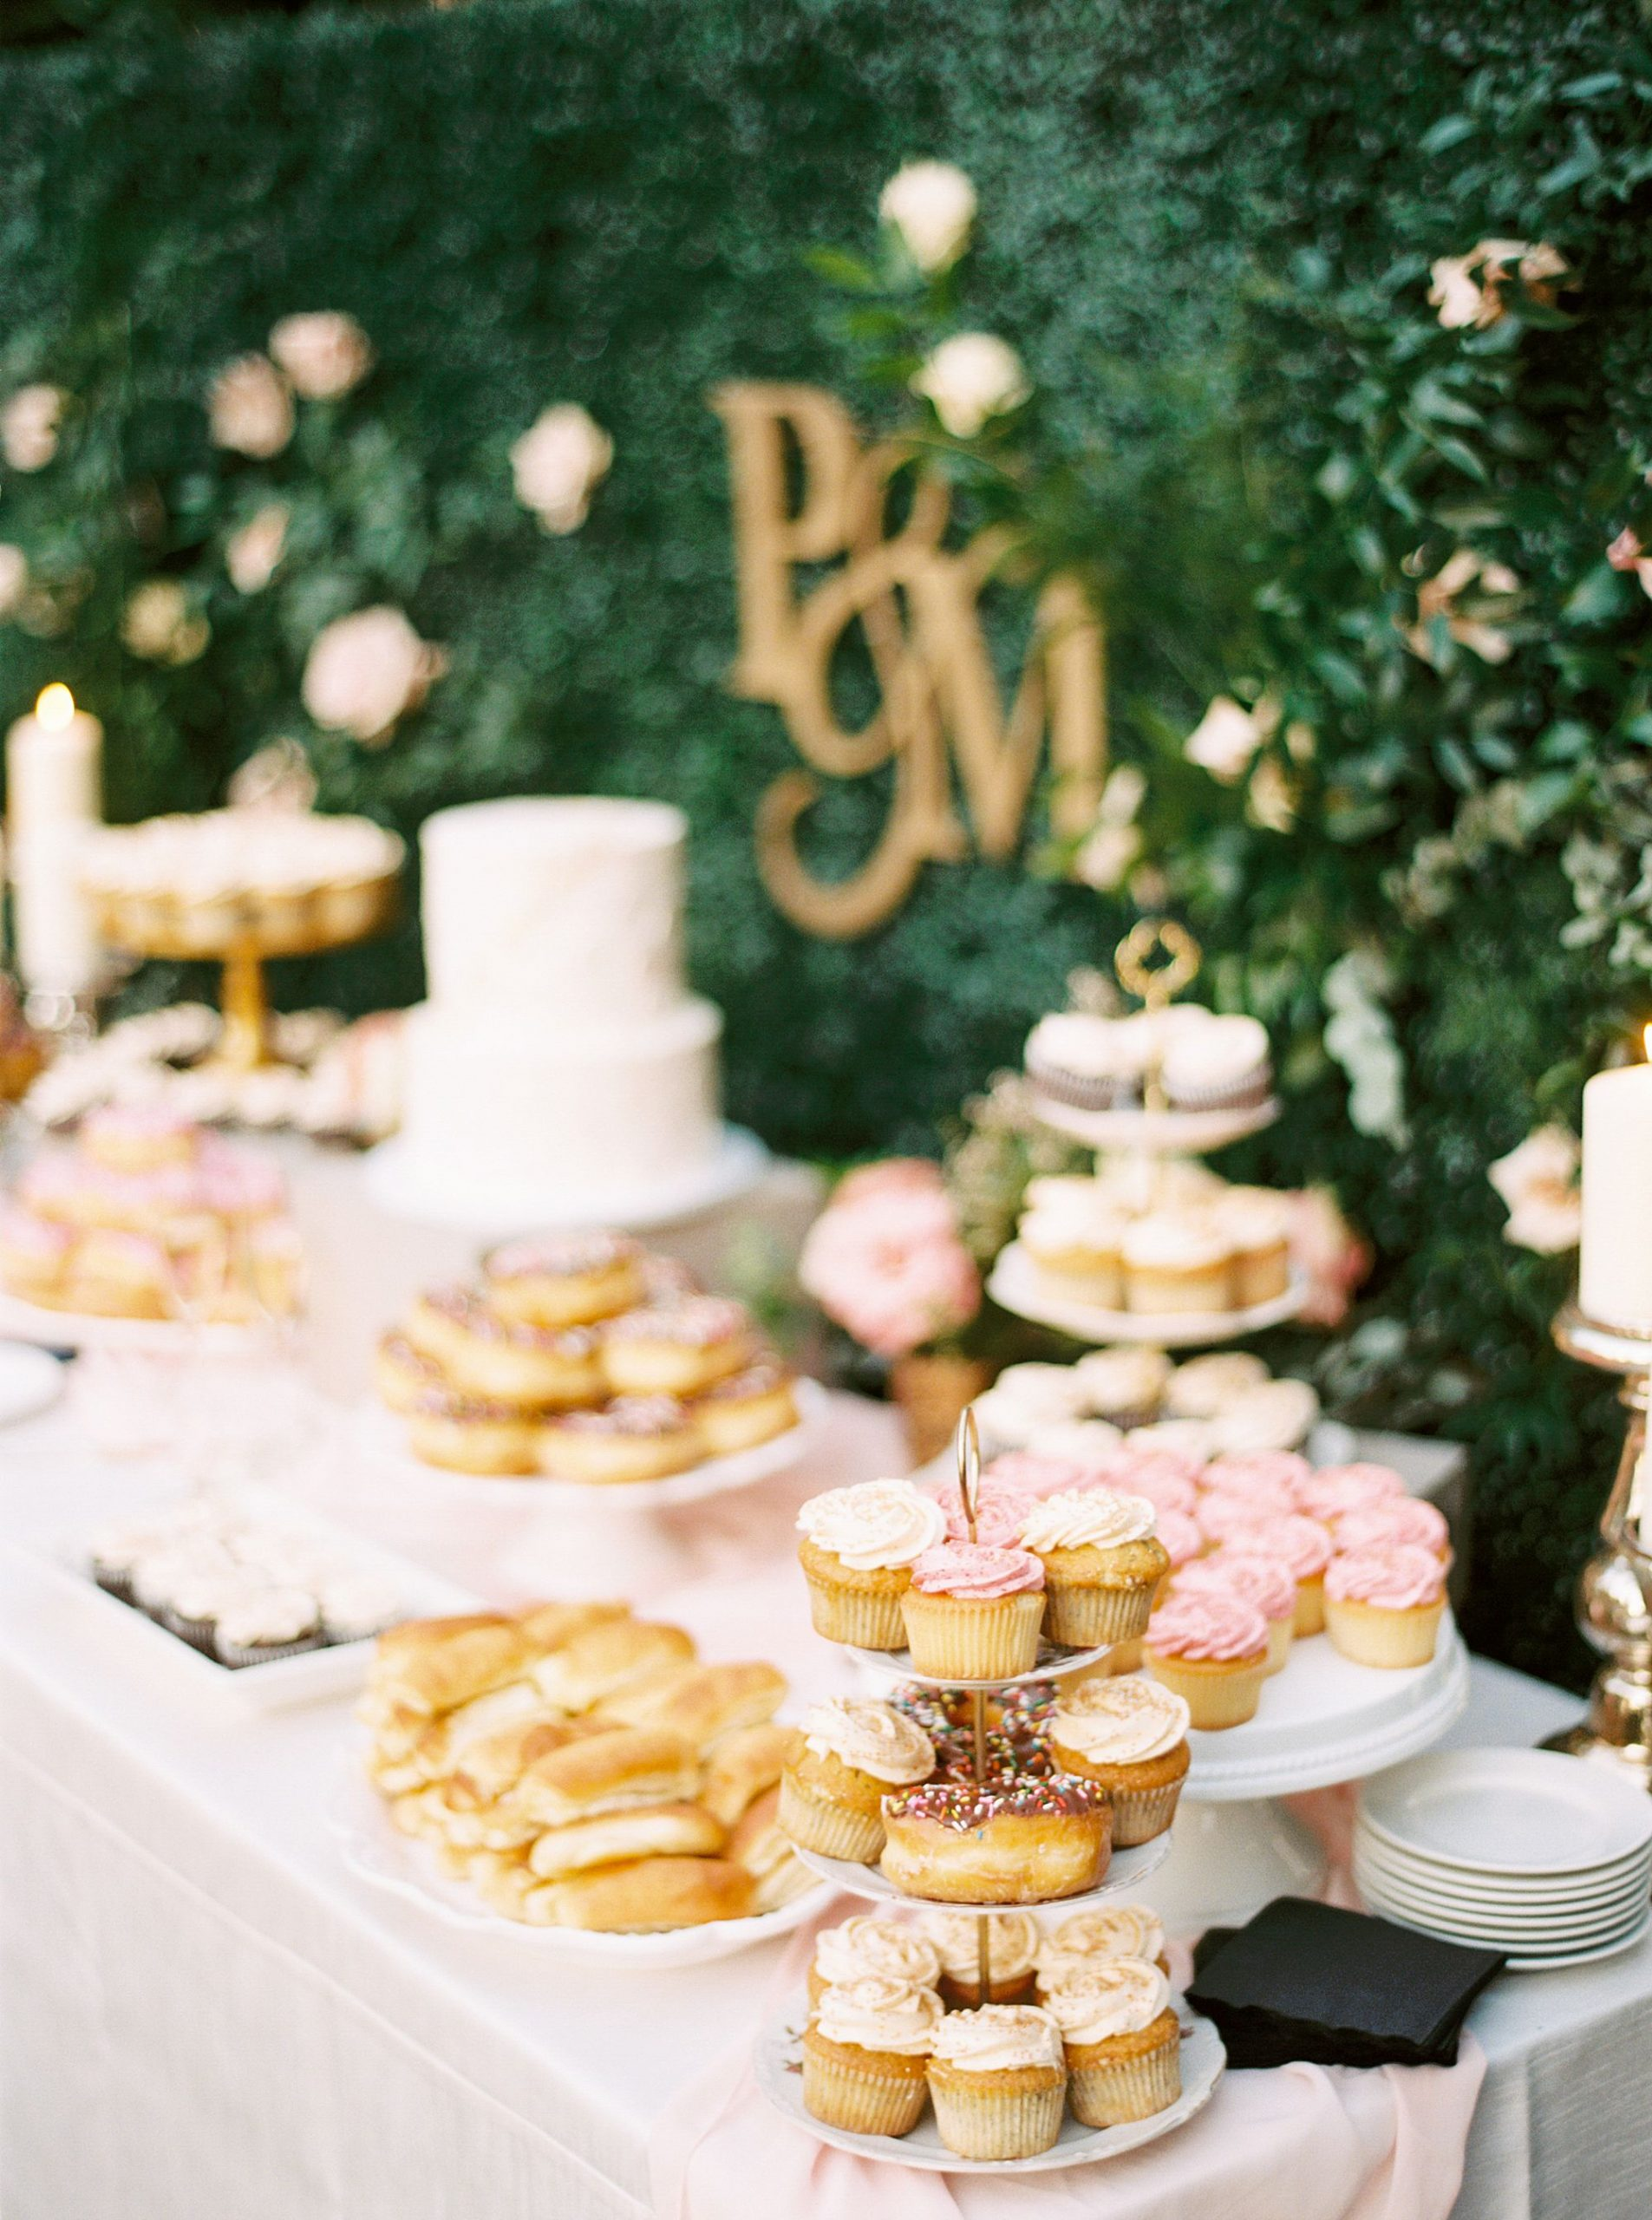 MITCHELLS MOUNTAIN MEADOWS Wedding - Ash Baumgartner - Phallina and Matt - Sierraville Wedding - Tahoe Wedding Photography_0025.jpg